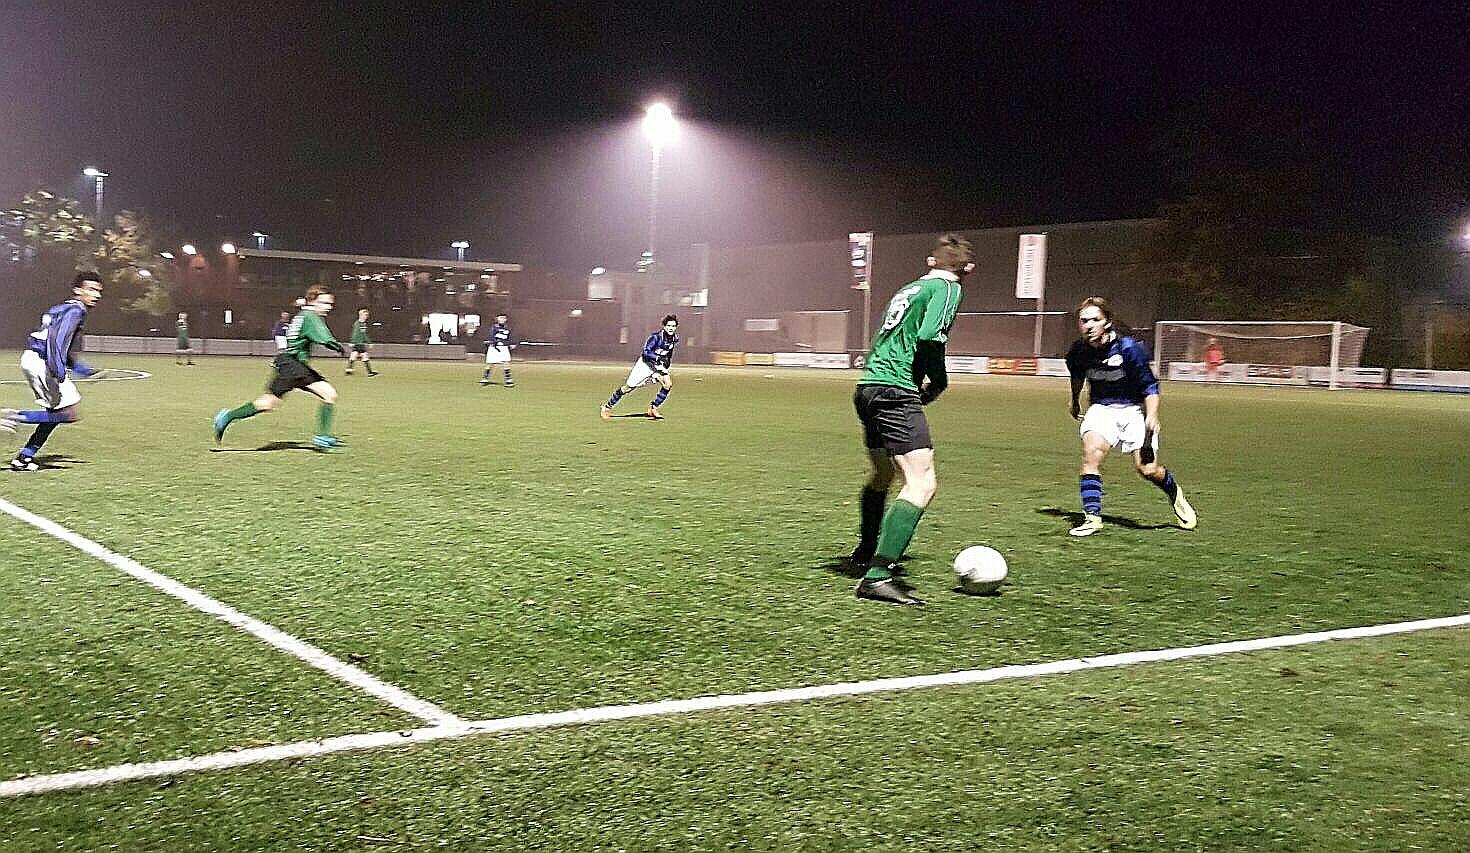 BSM - RCH - Voetbal in Haarlem